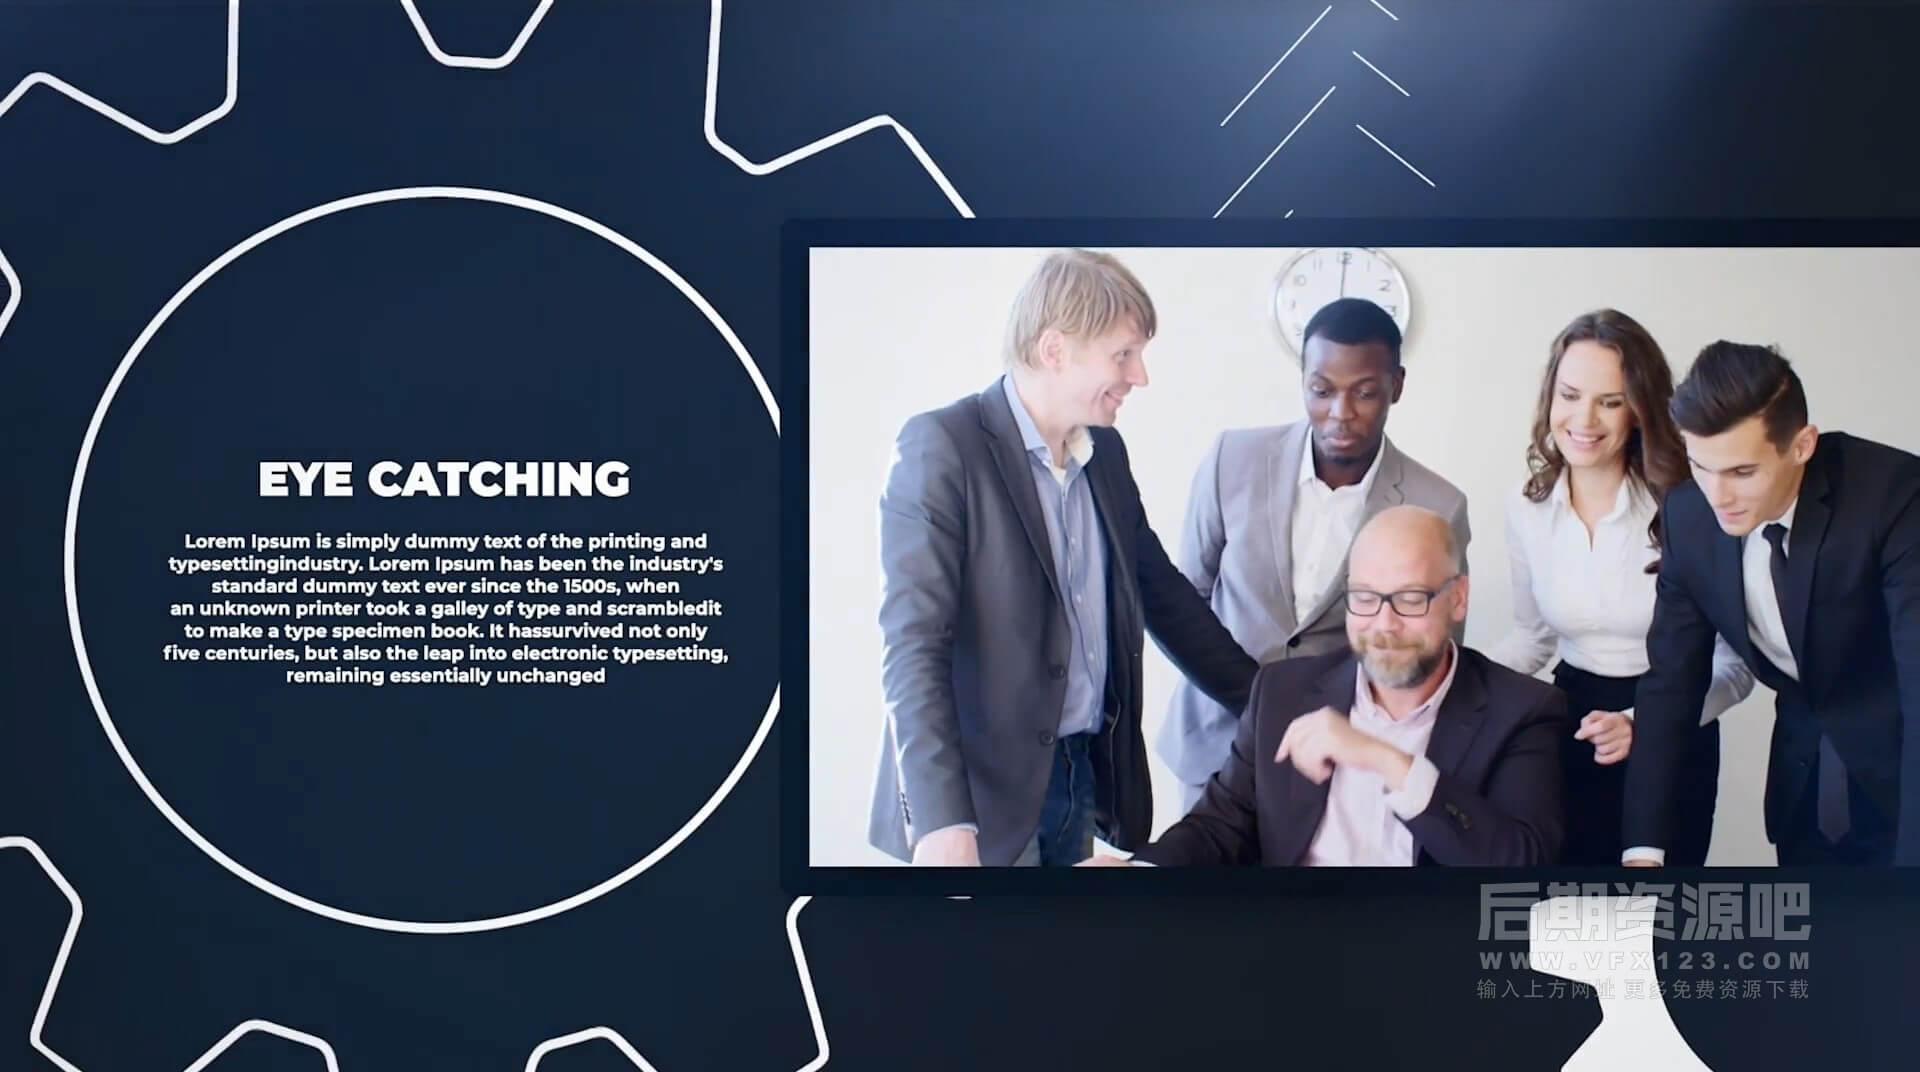 Motion模板 现代简洁企业介绍宣传片开场片头 Corporate Story